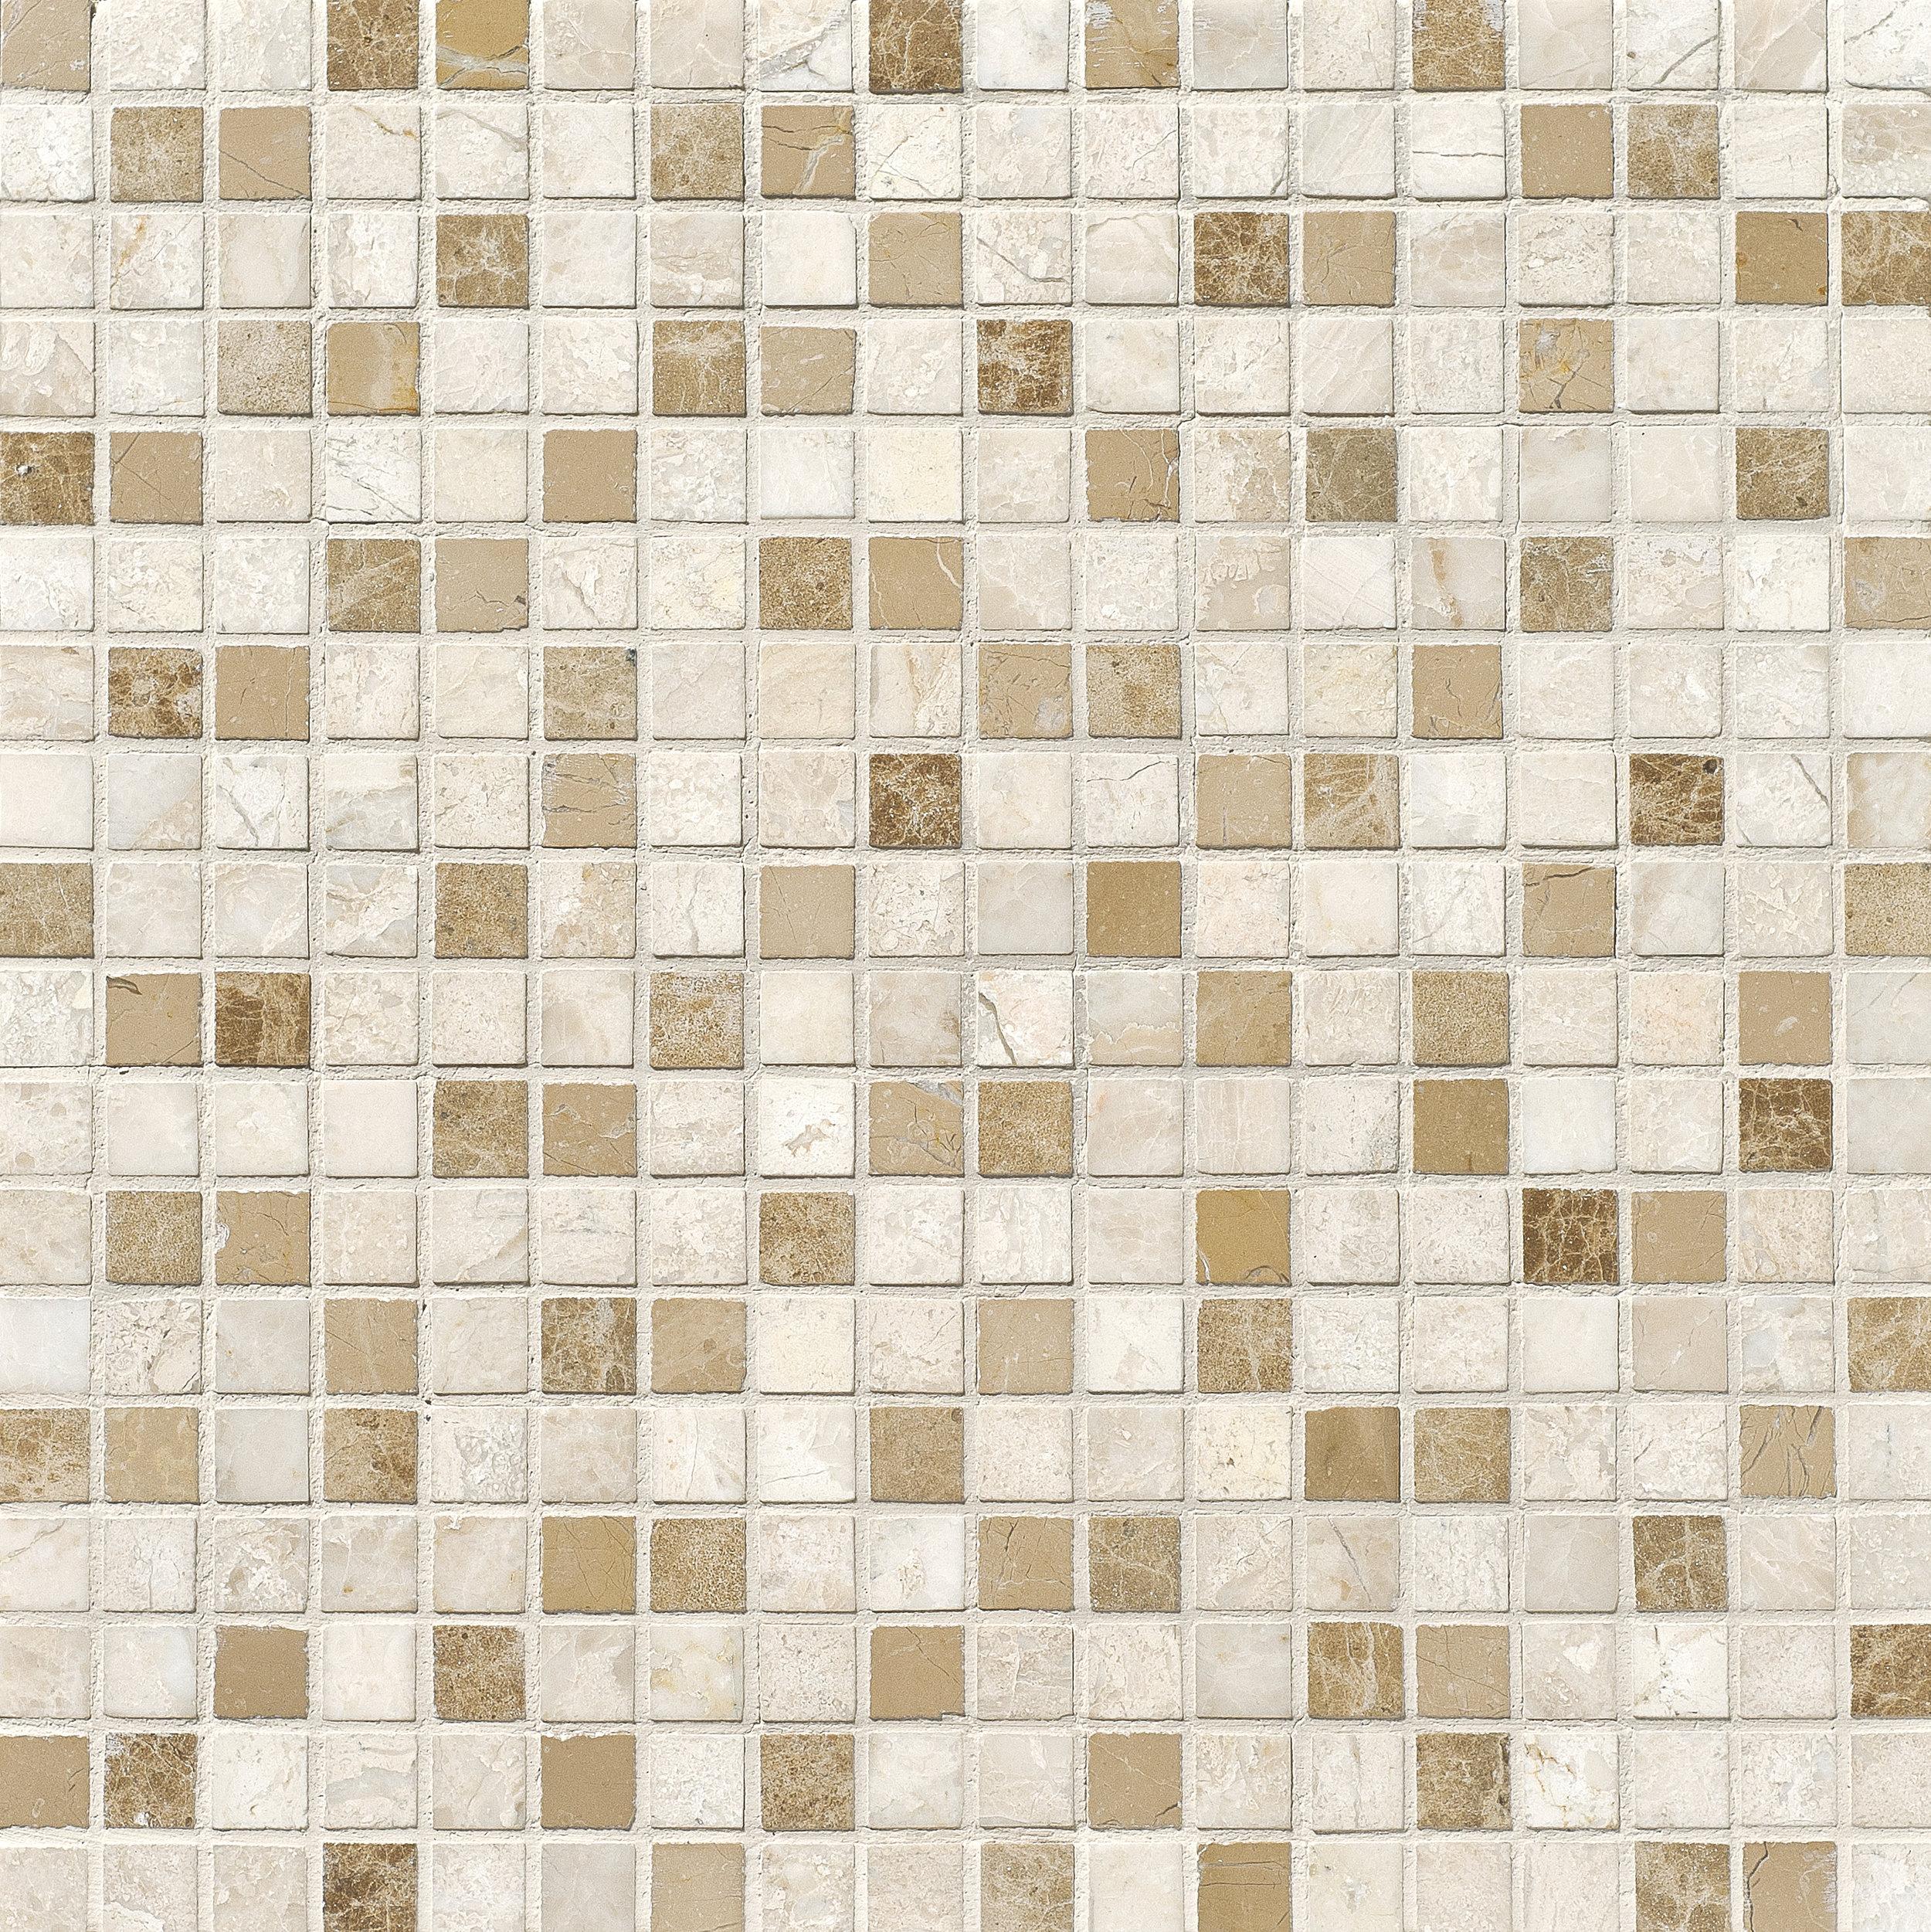 "MS01170 diana royal modern polished staggered mosaic 1 1/4""x6"" 12""x12""x3/8"" sheets"